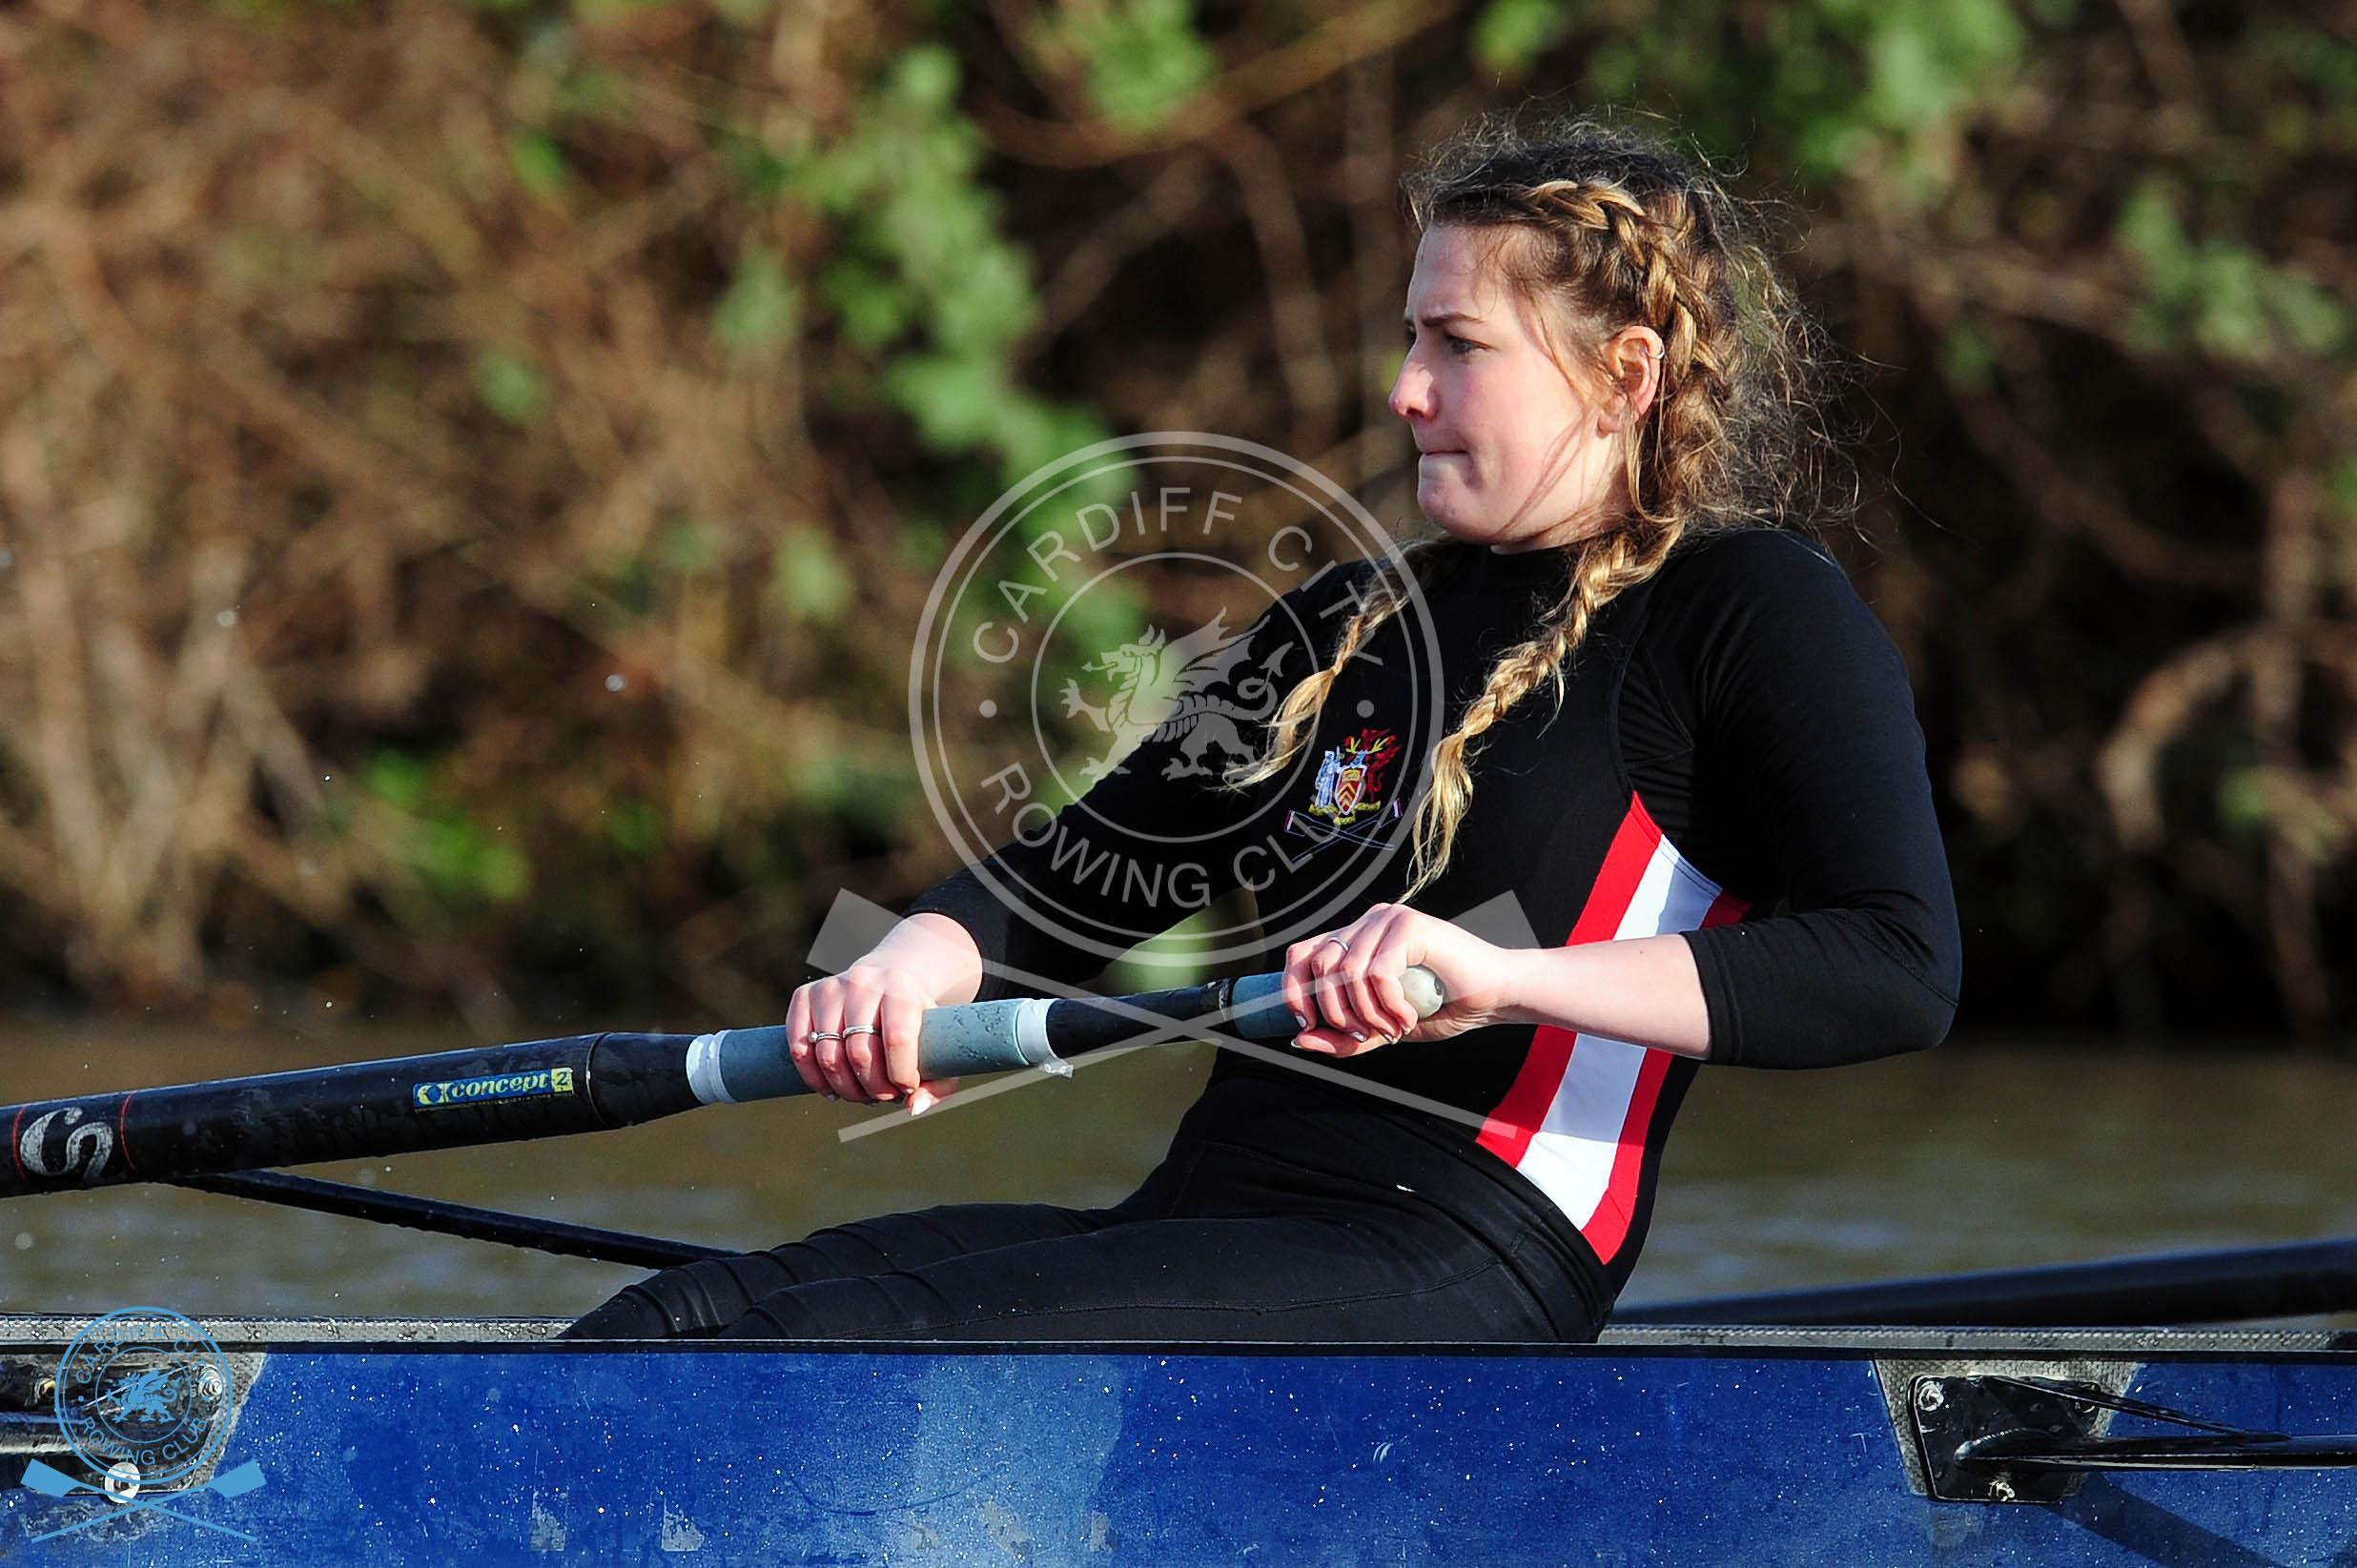 DW_280119_Cardiff_City_Rowing_253.jpg